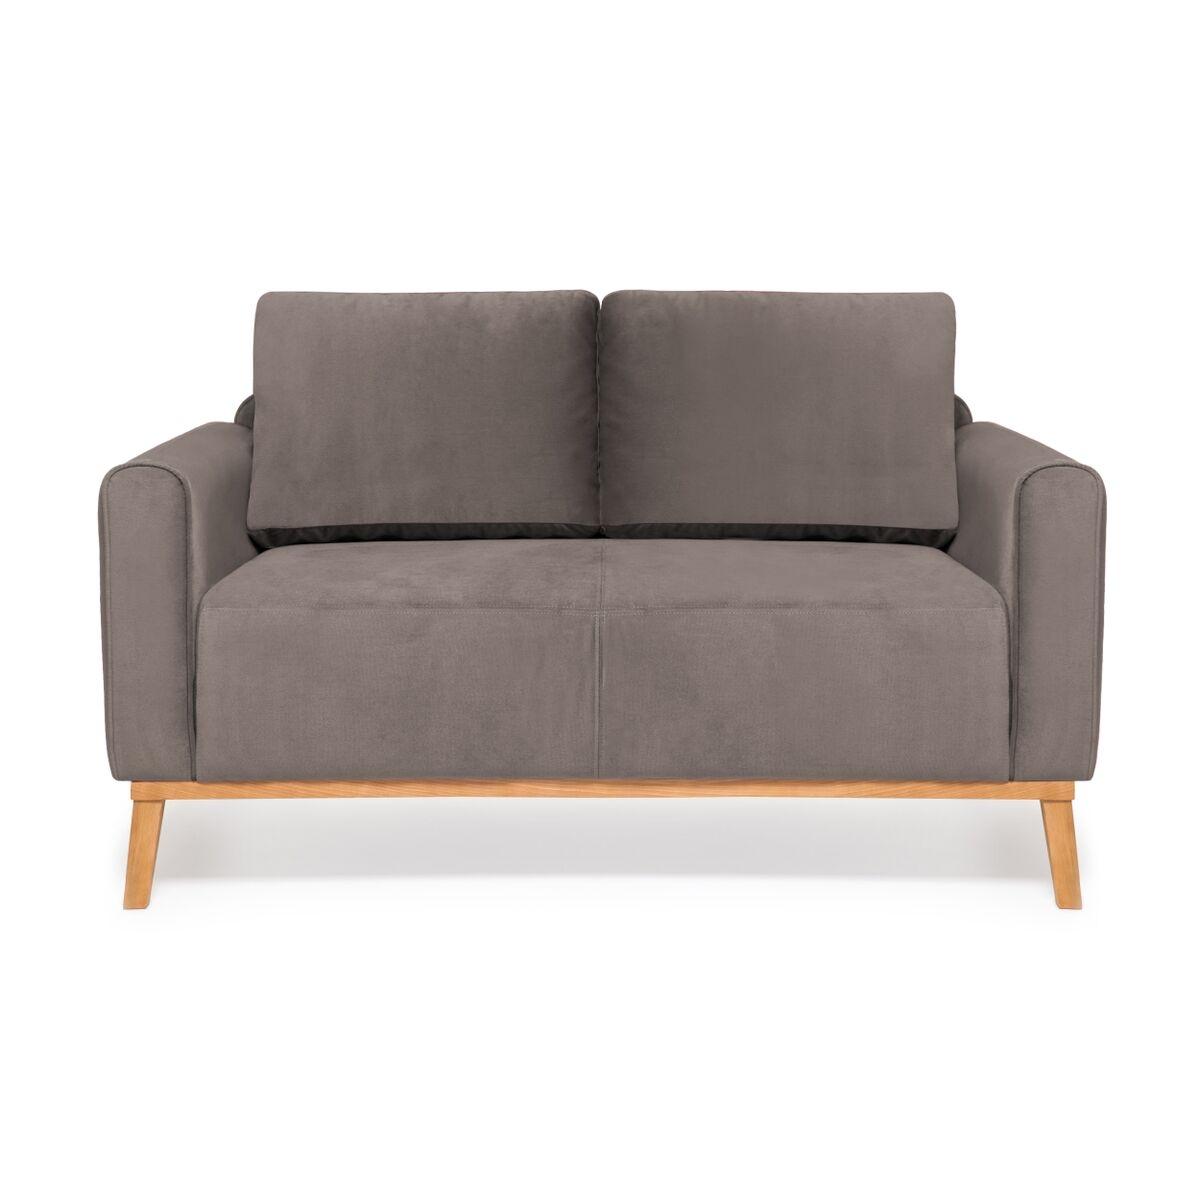 Canapea Fixa 2 locuri Milton Trend Grey